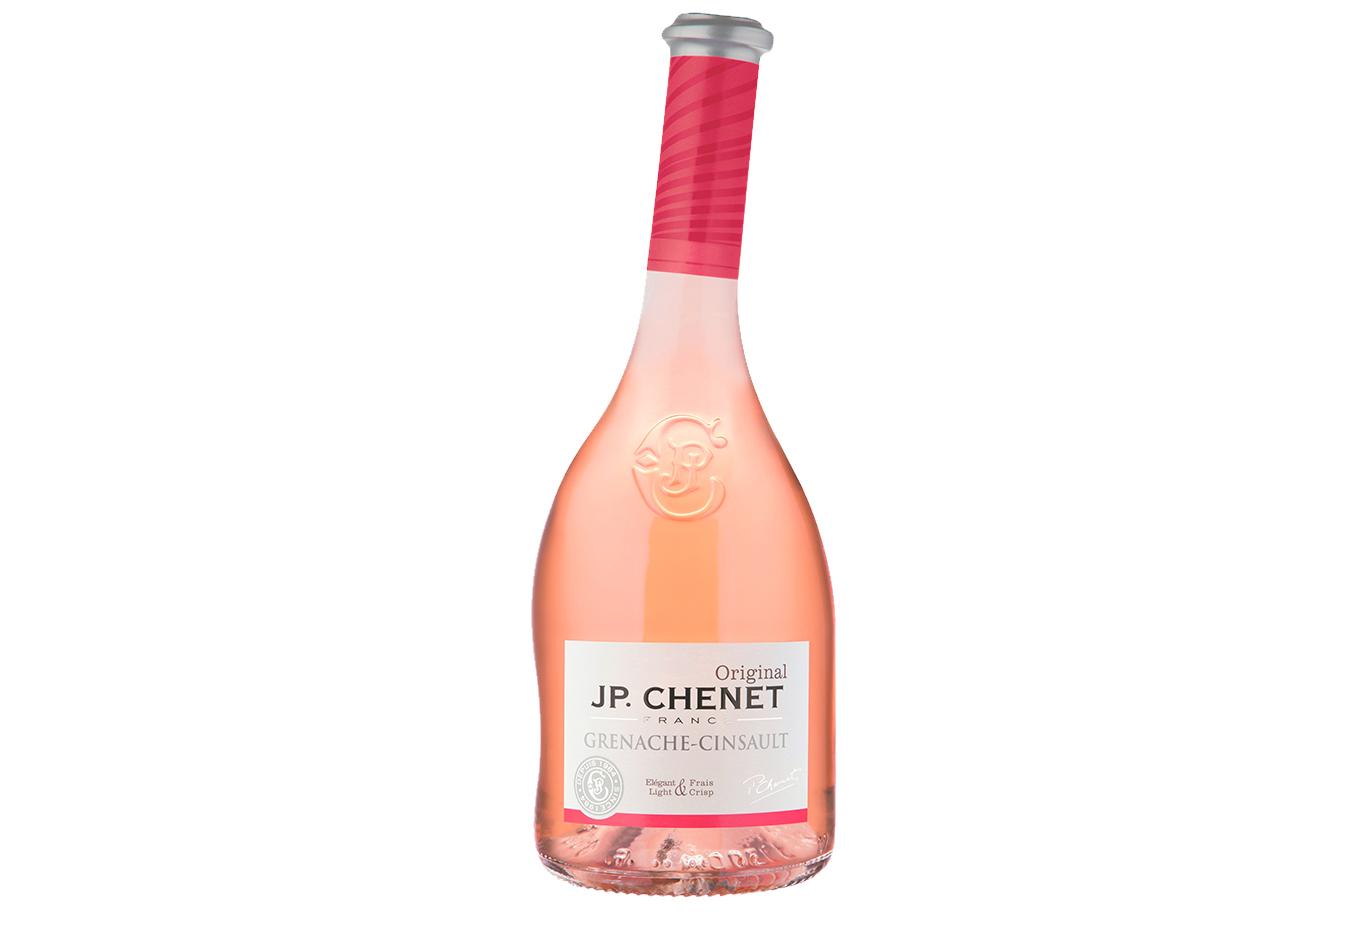 JP Chenet Dry Rosé